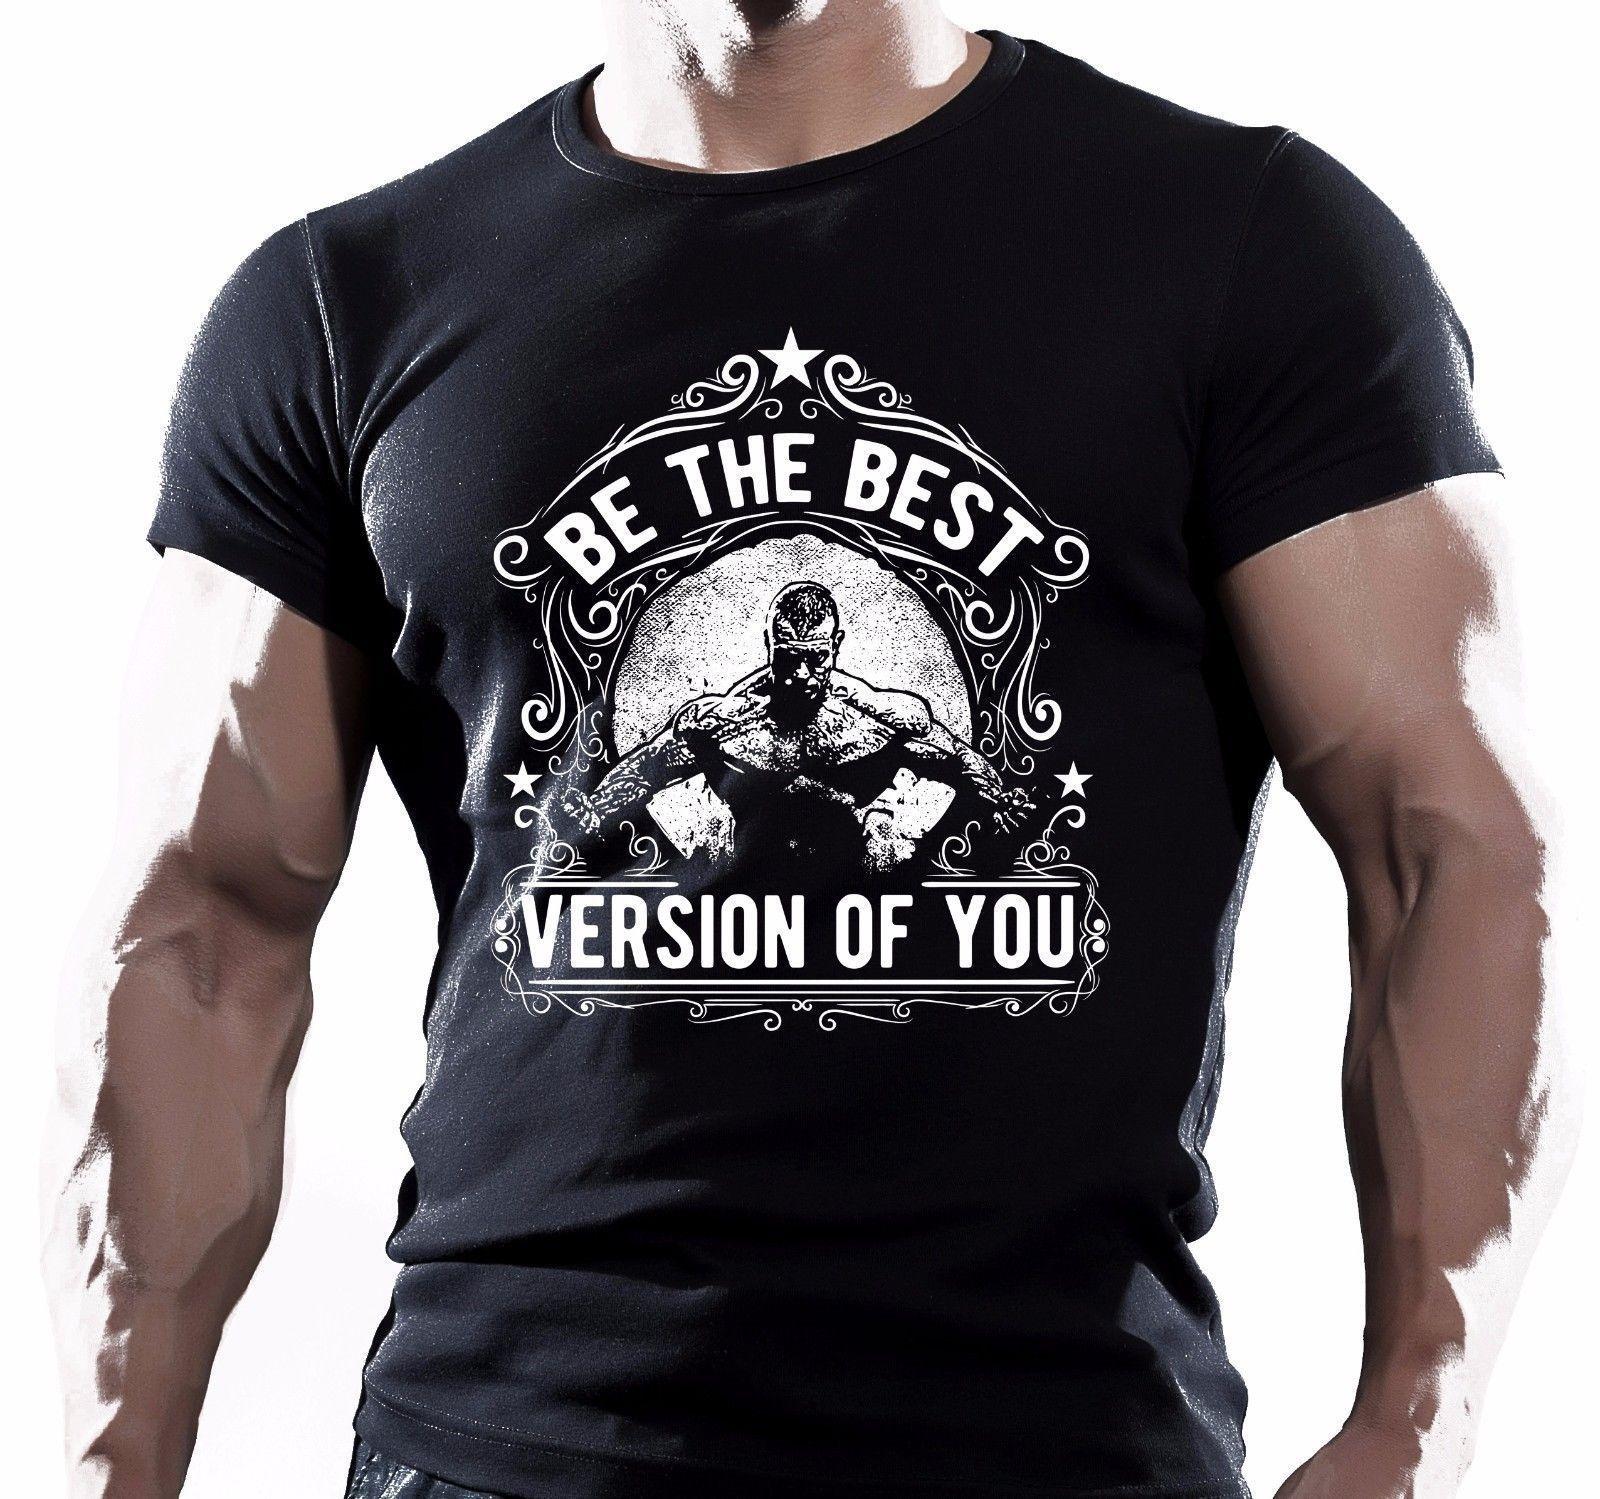 2019 neue Ankunfts-Herrenmode The Best Of You Versione Trainer Bodybuilding Motivante T-Shirt Trainings-Druck-T-Shirts